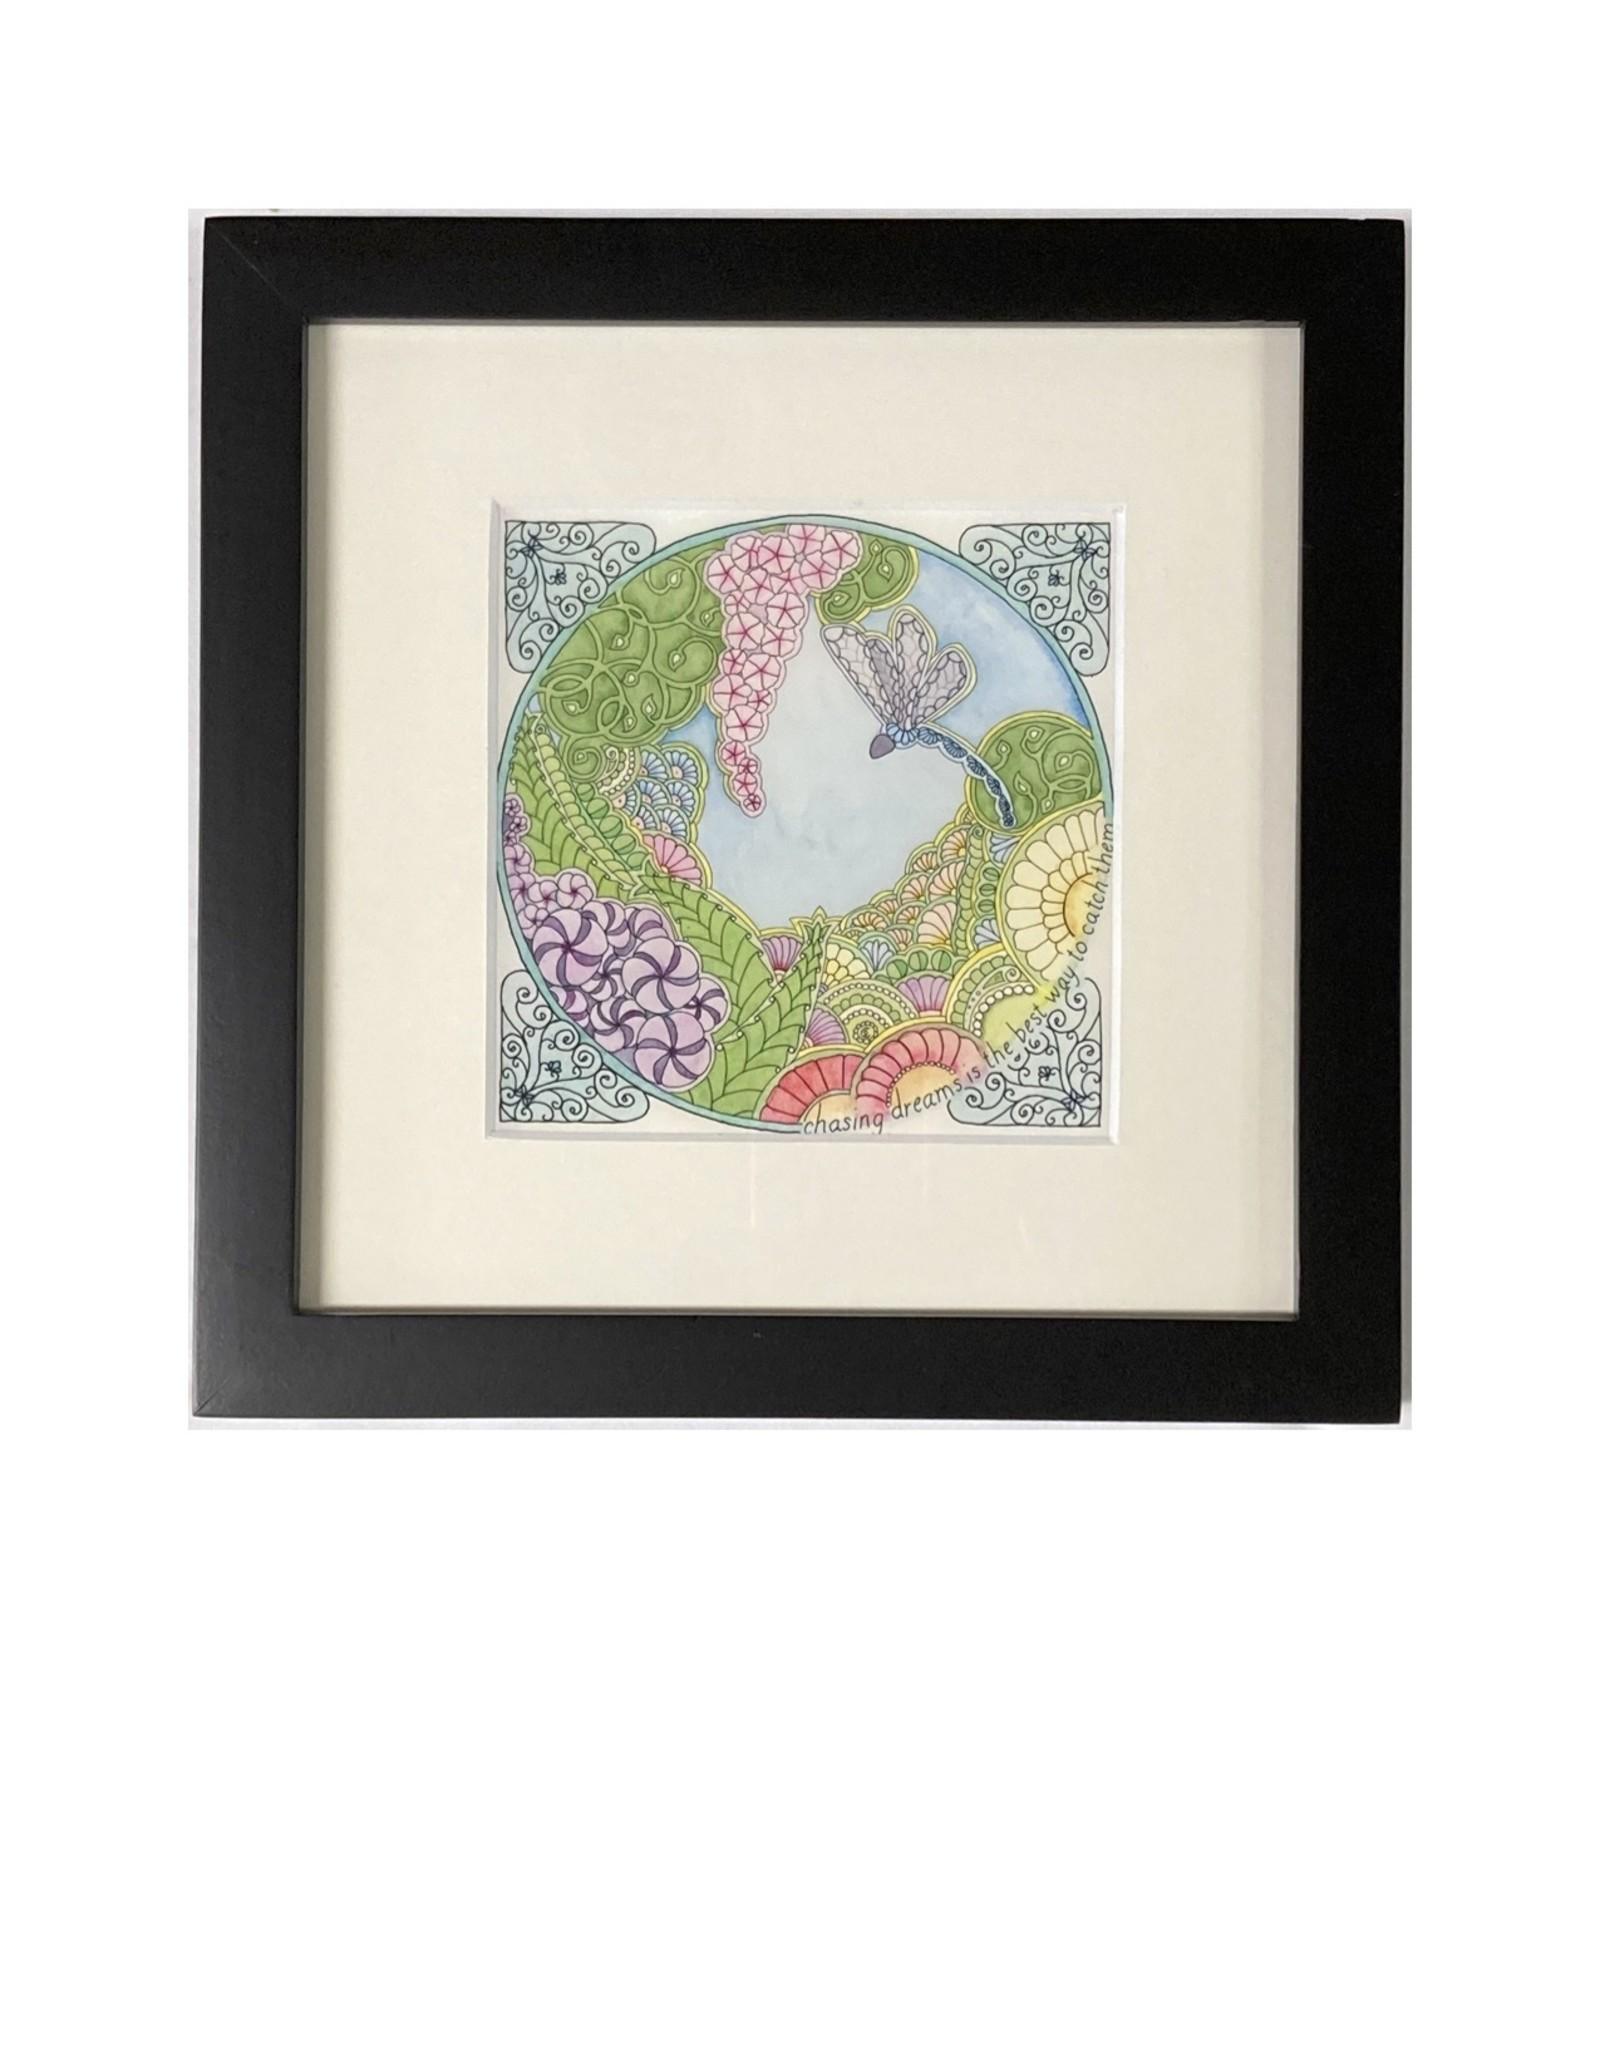 Kelly Casperson Catching Dreams framed print